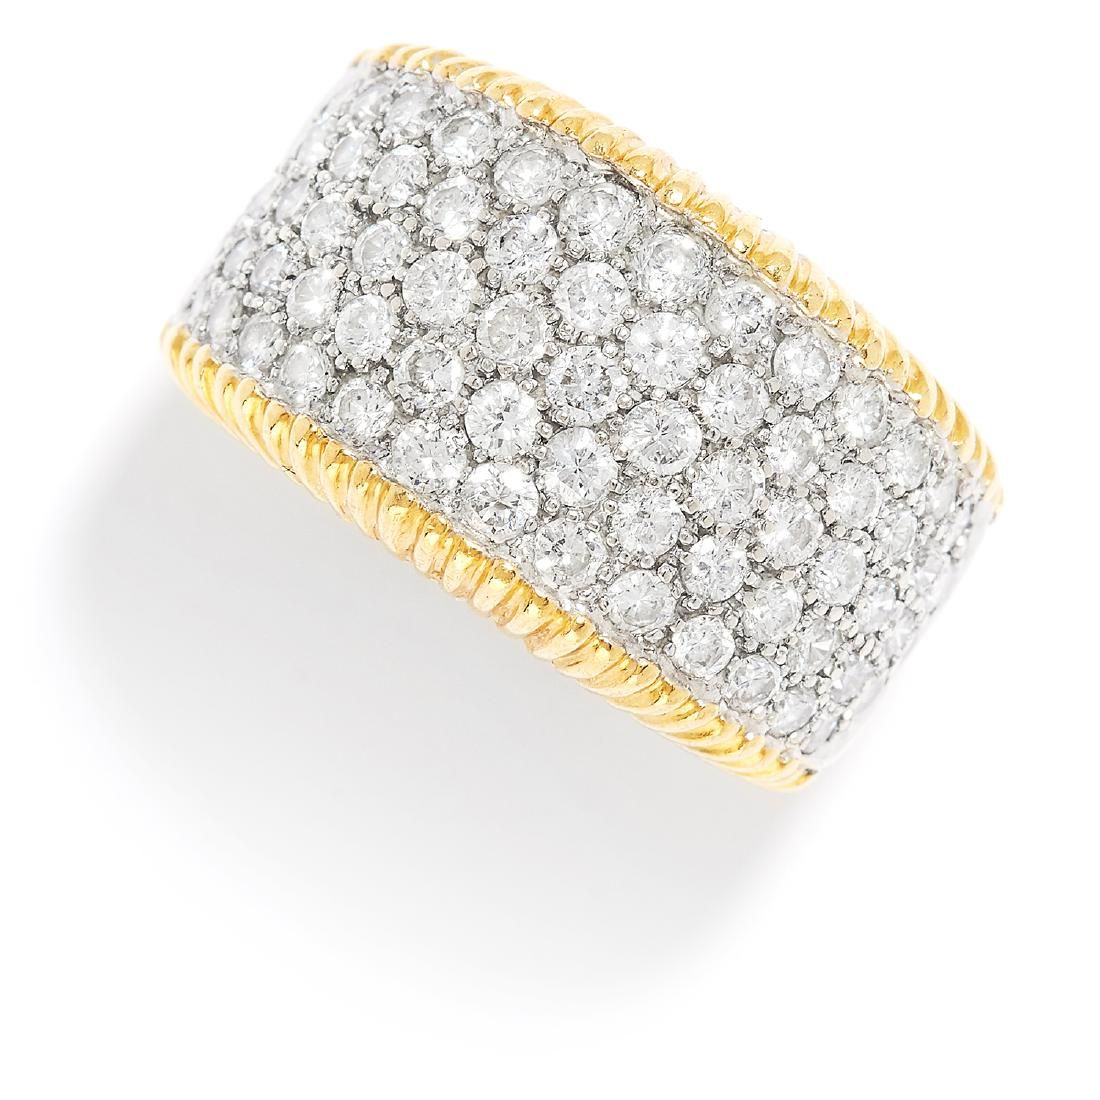 1.60 CARAT DIAMOND DRESS RING in 18ct yellow and white